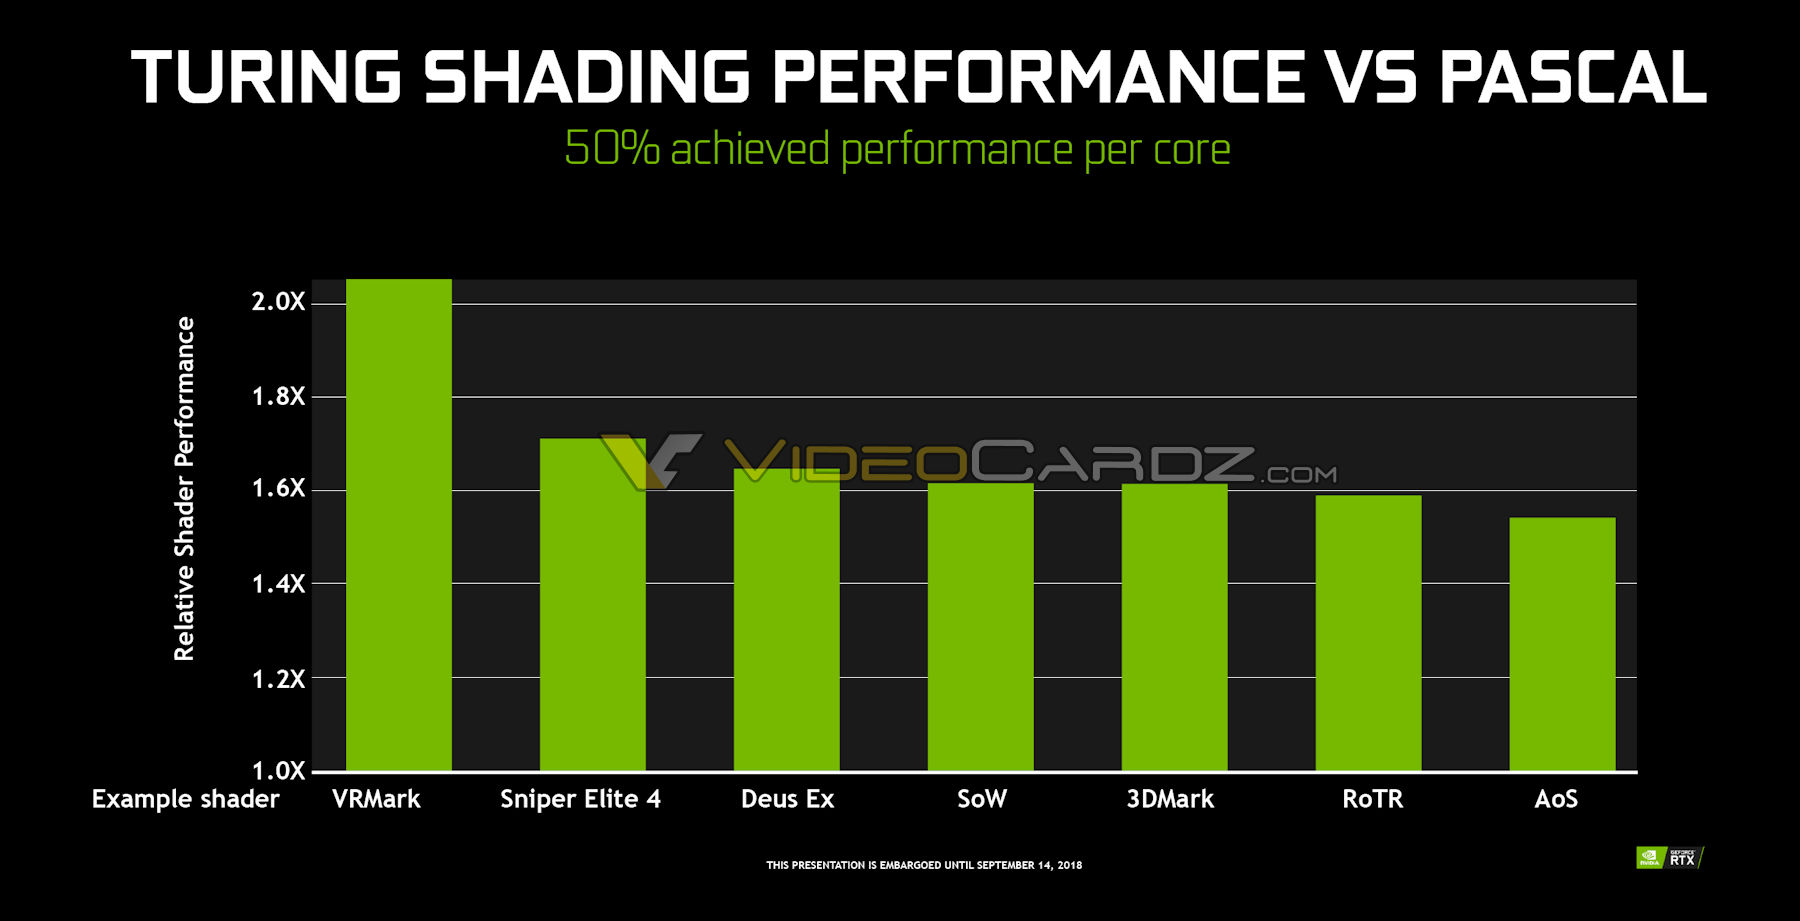 Leaked Geforce Rtx 2070 Rtx 2080 Benchmark Faster Than Gtx 1080 Ti on 3dmark